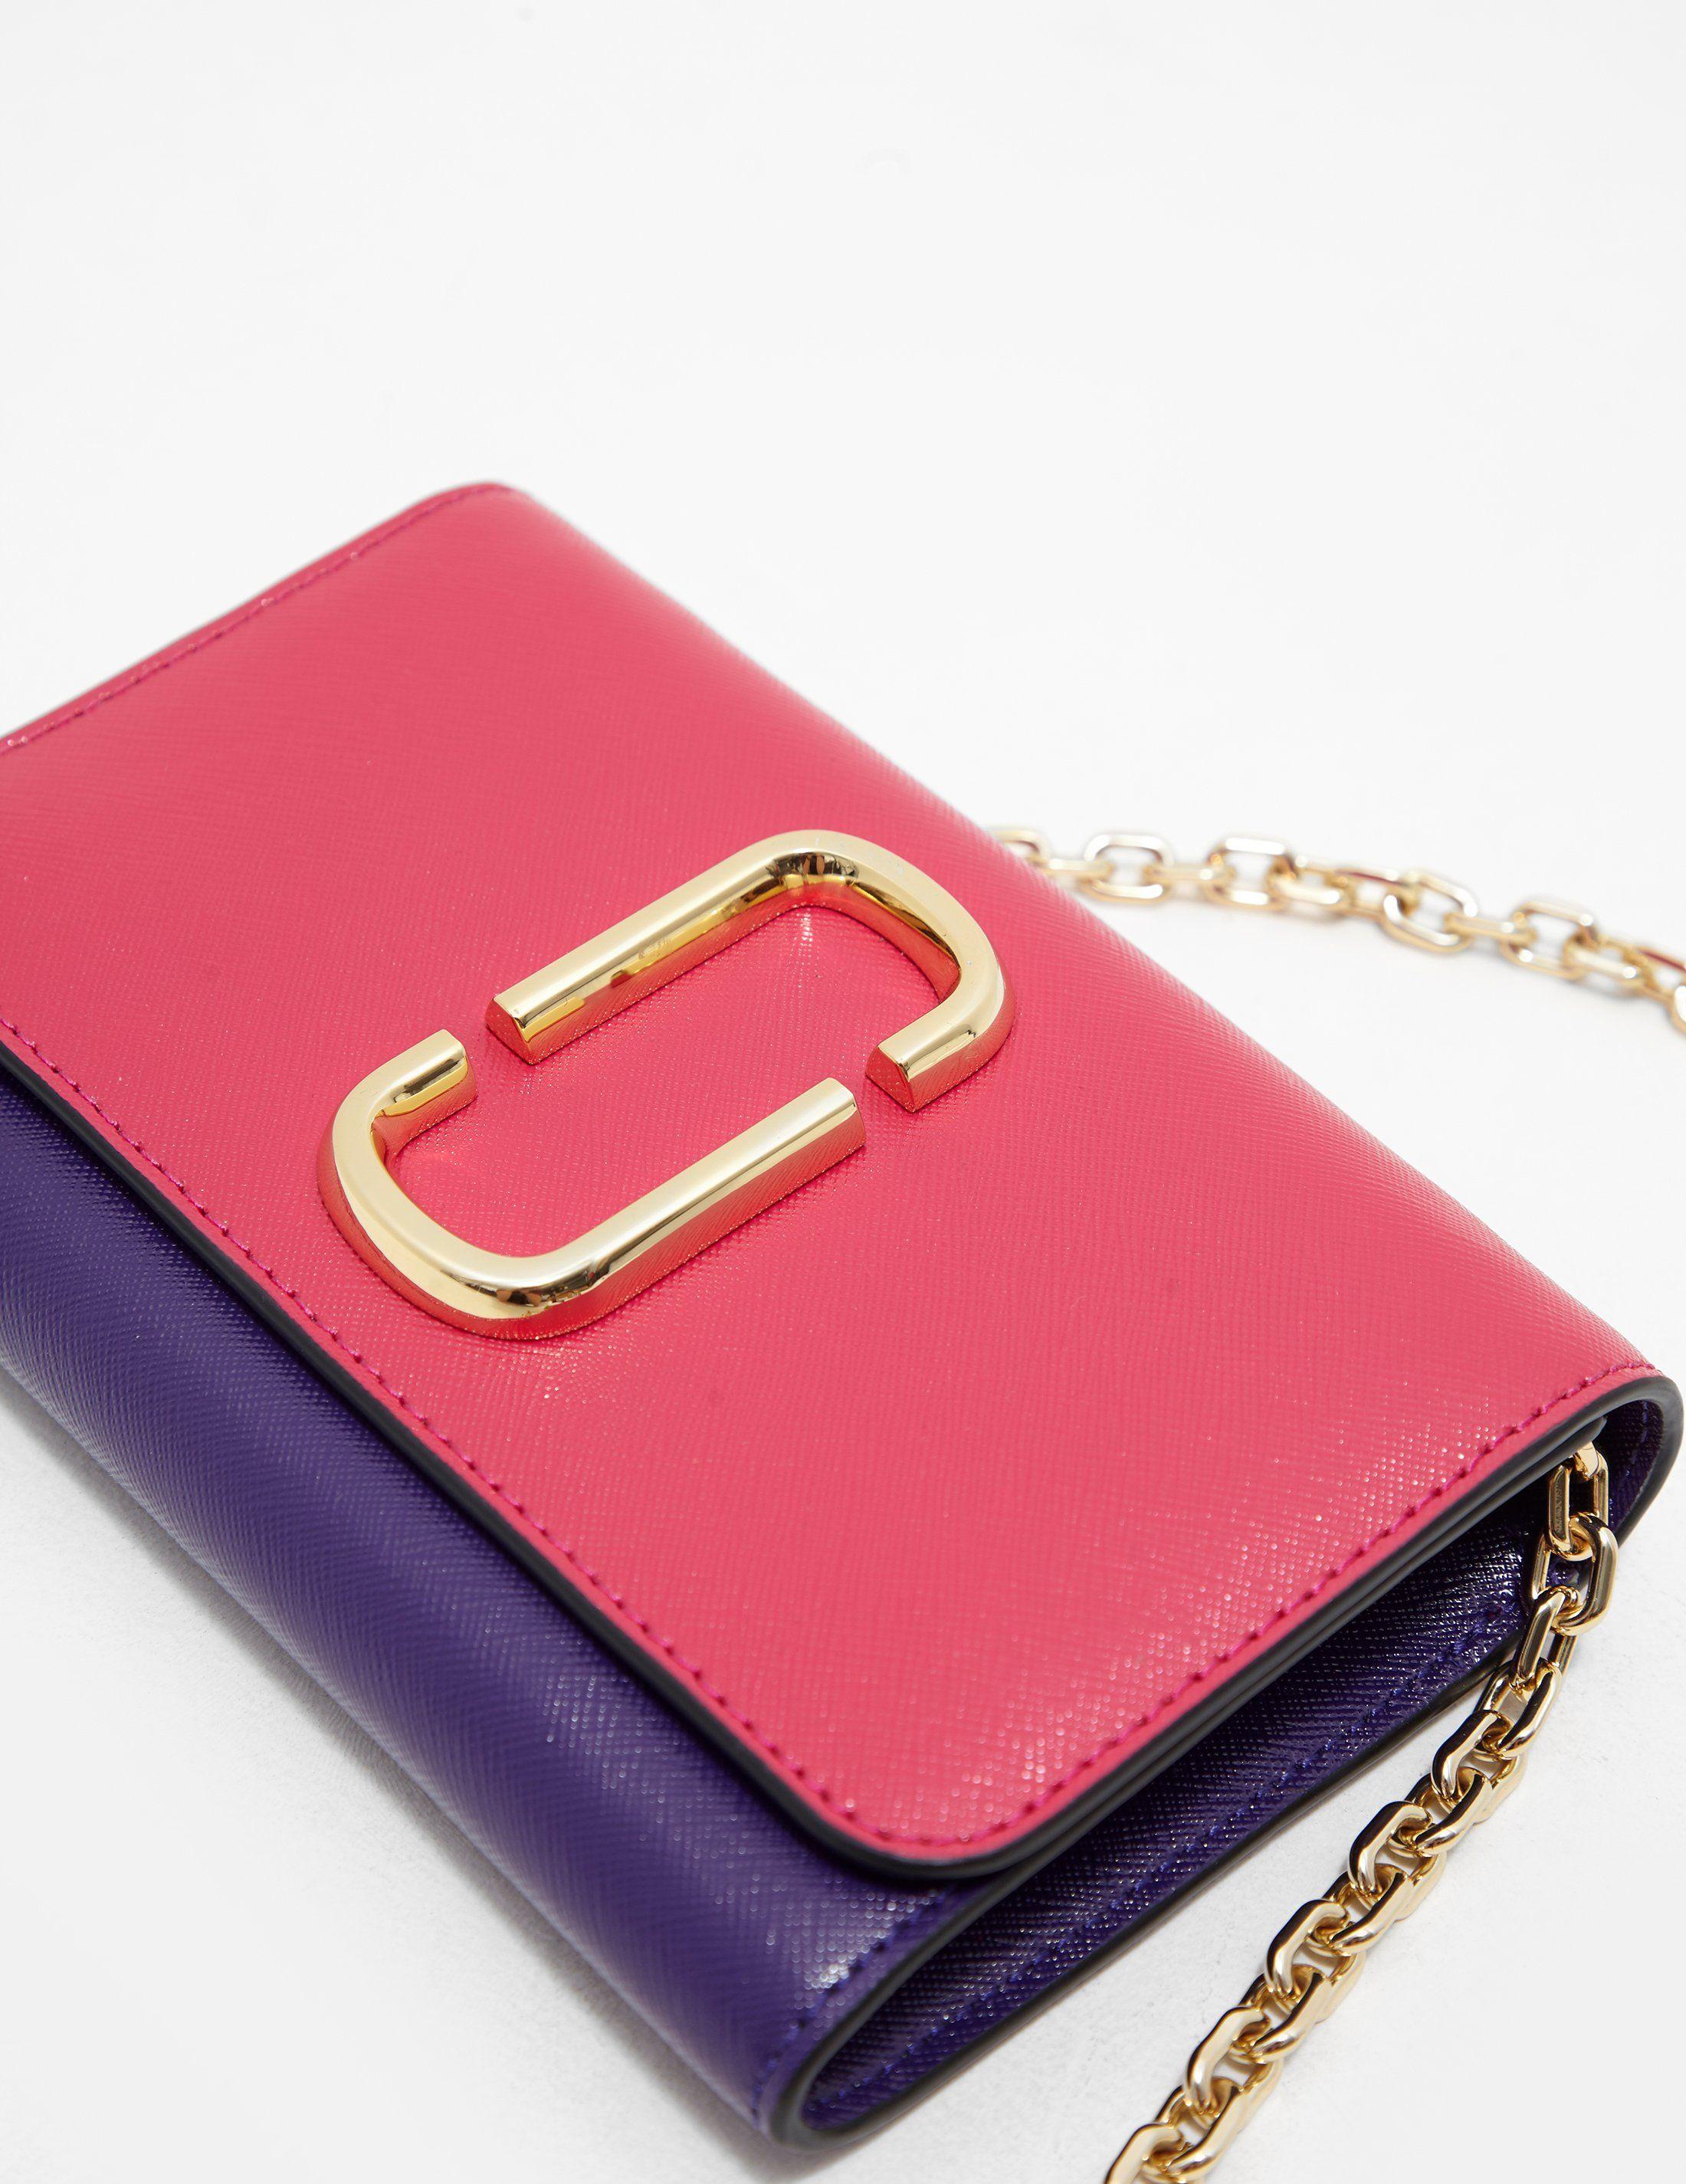 Marc Jacobs Snapshot Chain Shoulder Bag